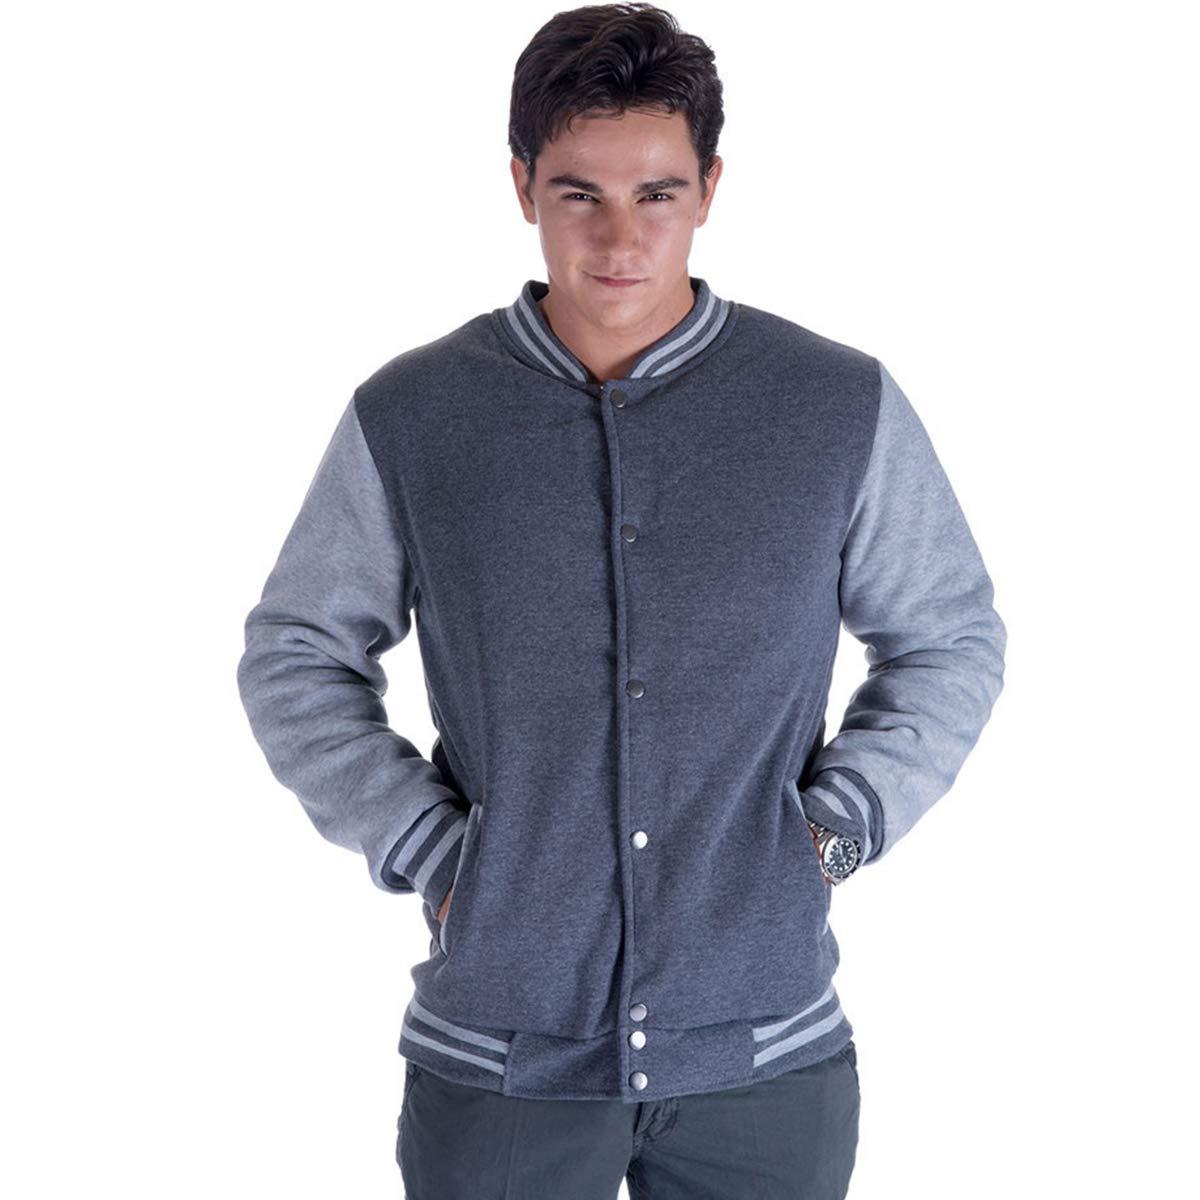 Urimoser Mens Varsity Baseball Jackets Sherpa Lined Lightweight Bomber Cotton Jackets